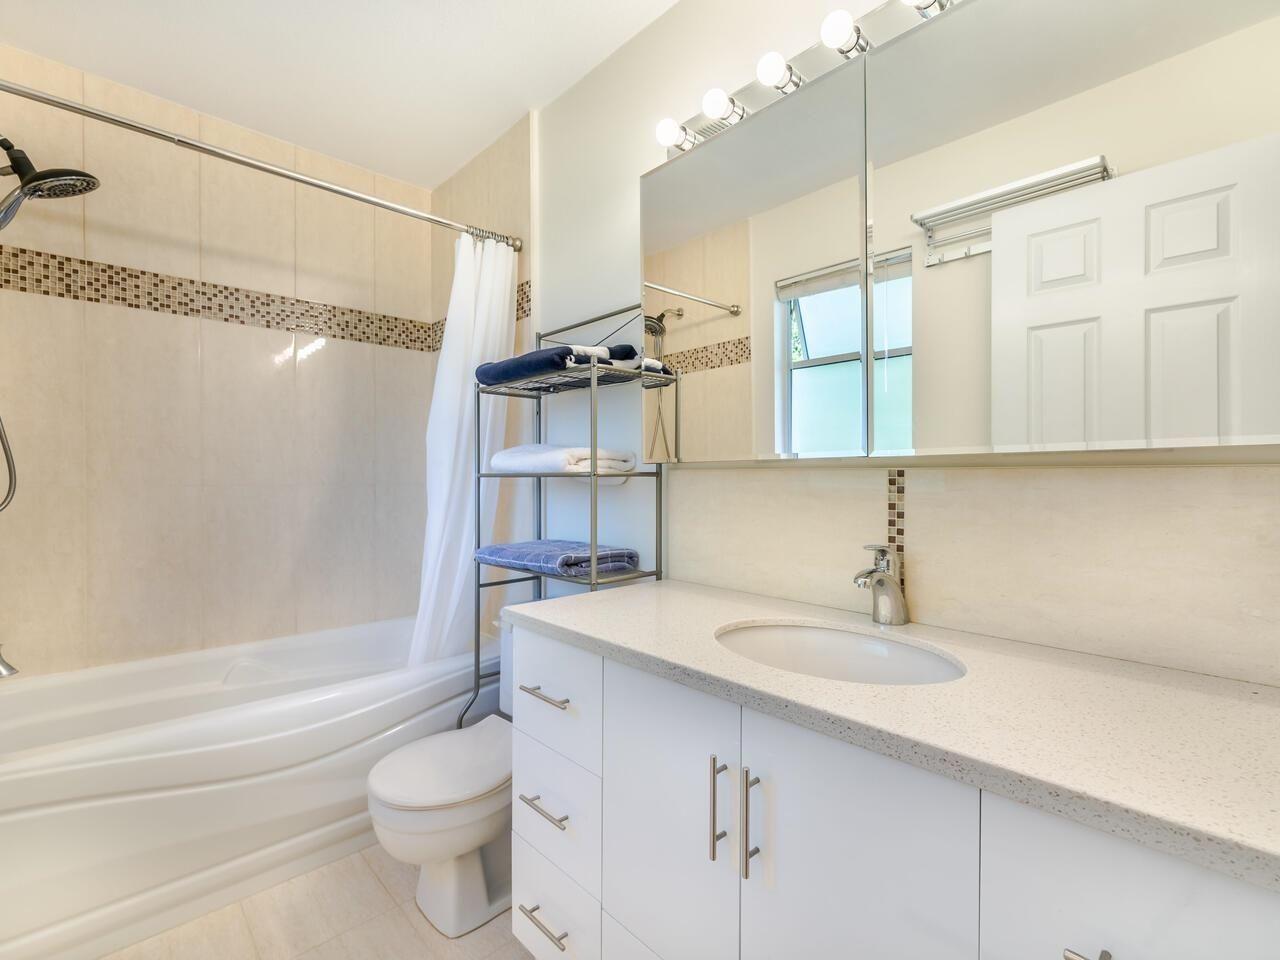 Photo 18: Photos: 5602 WILSON Court in Richmond: Hamilton RI House for sale : MLS®# R2602420